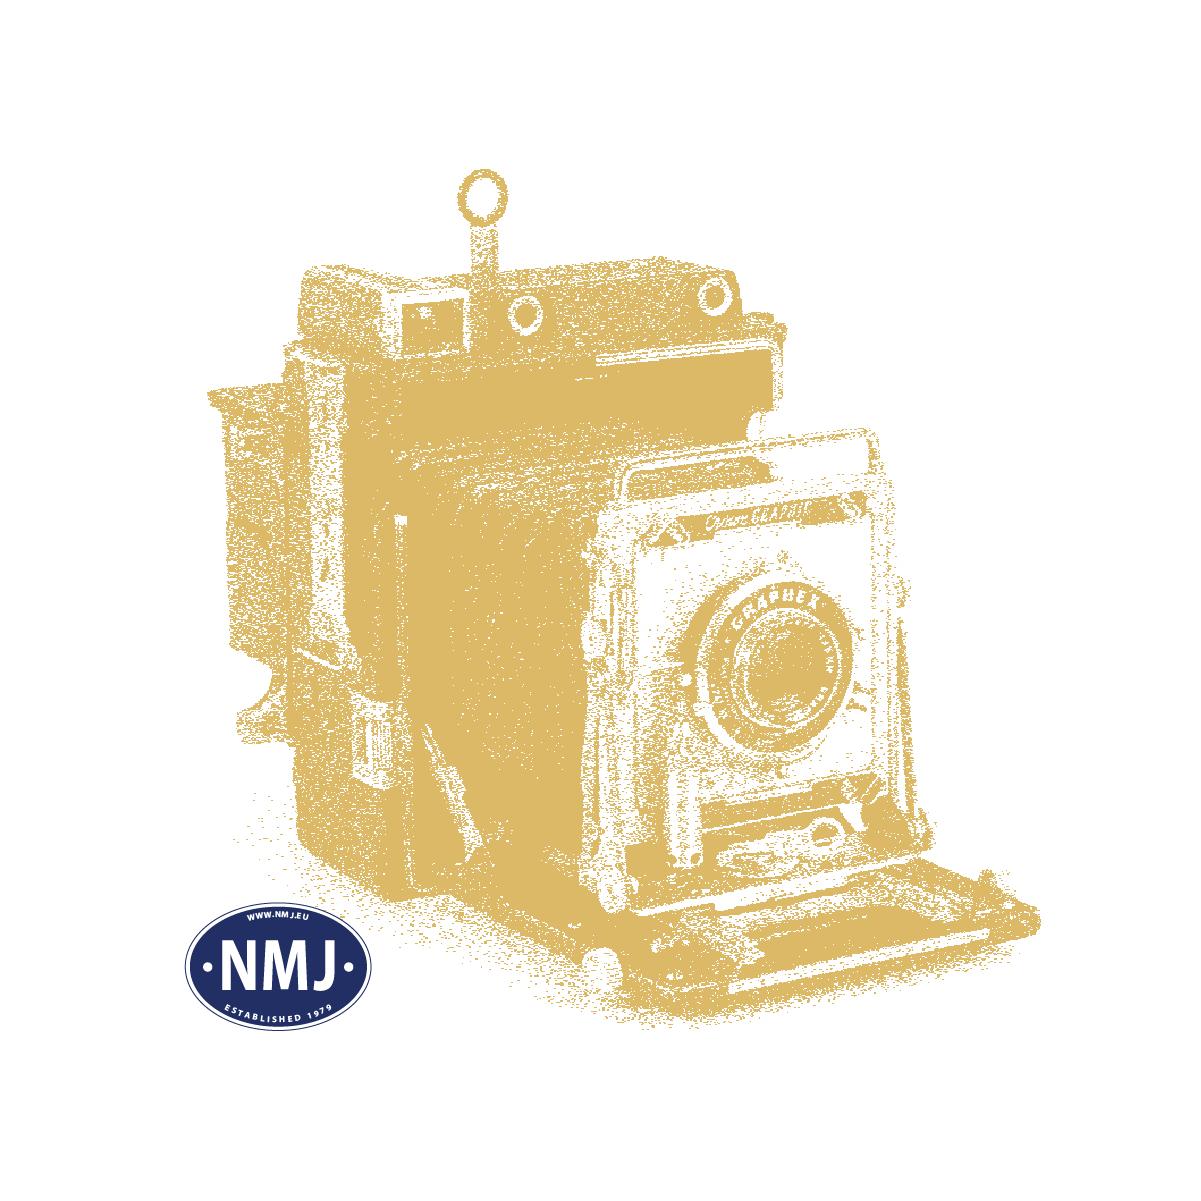 NMJT145003 - NMJ Topline NSB Di3.623, Rotbraun, Spur 0